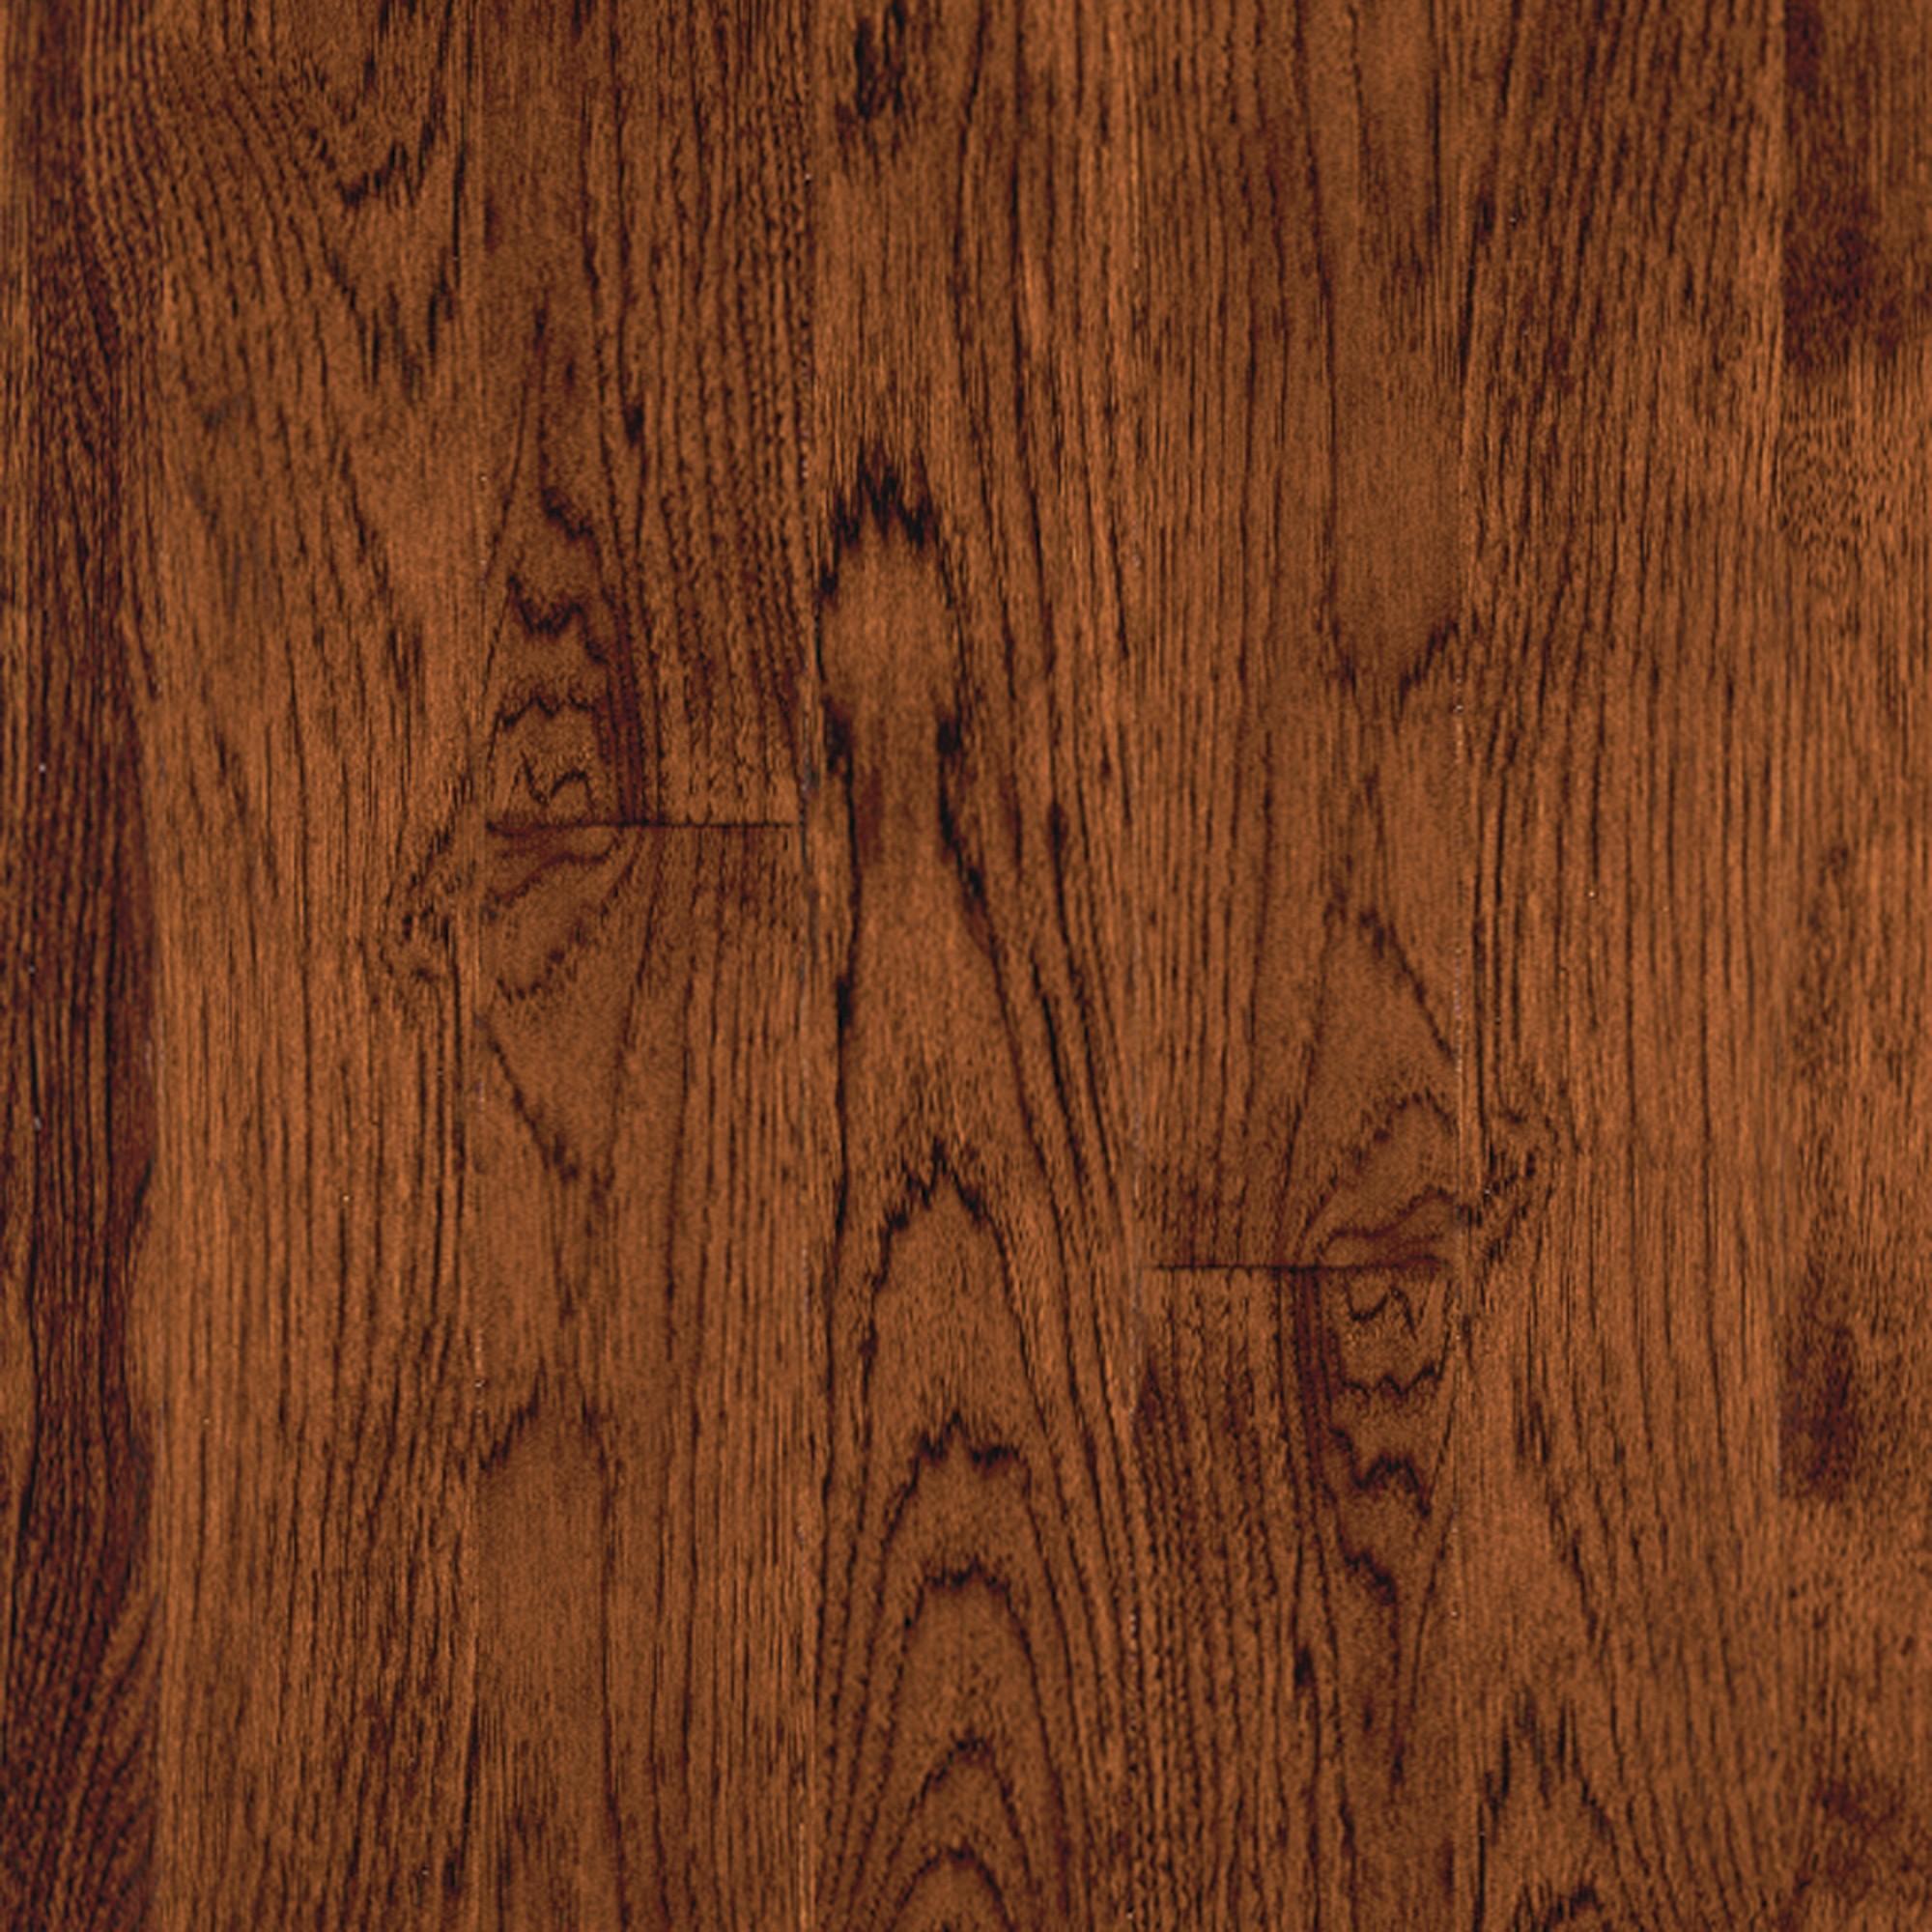 Smooth Hickory Winchester Vintage Hardwood Flooring